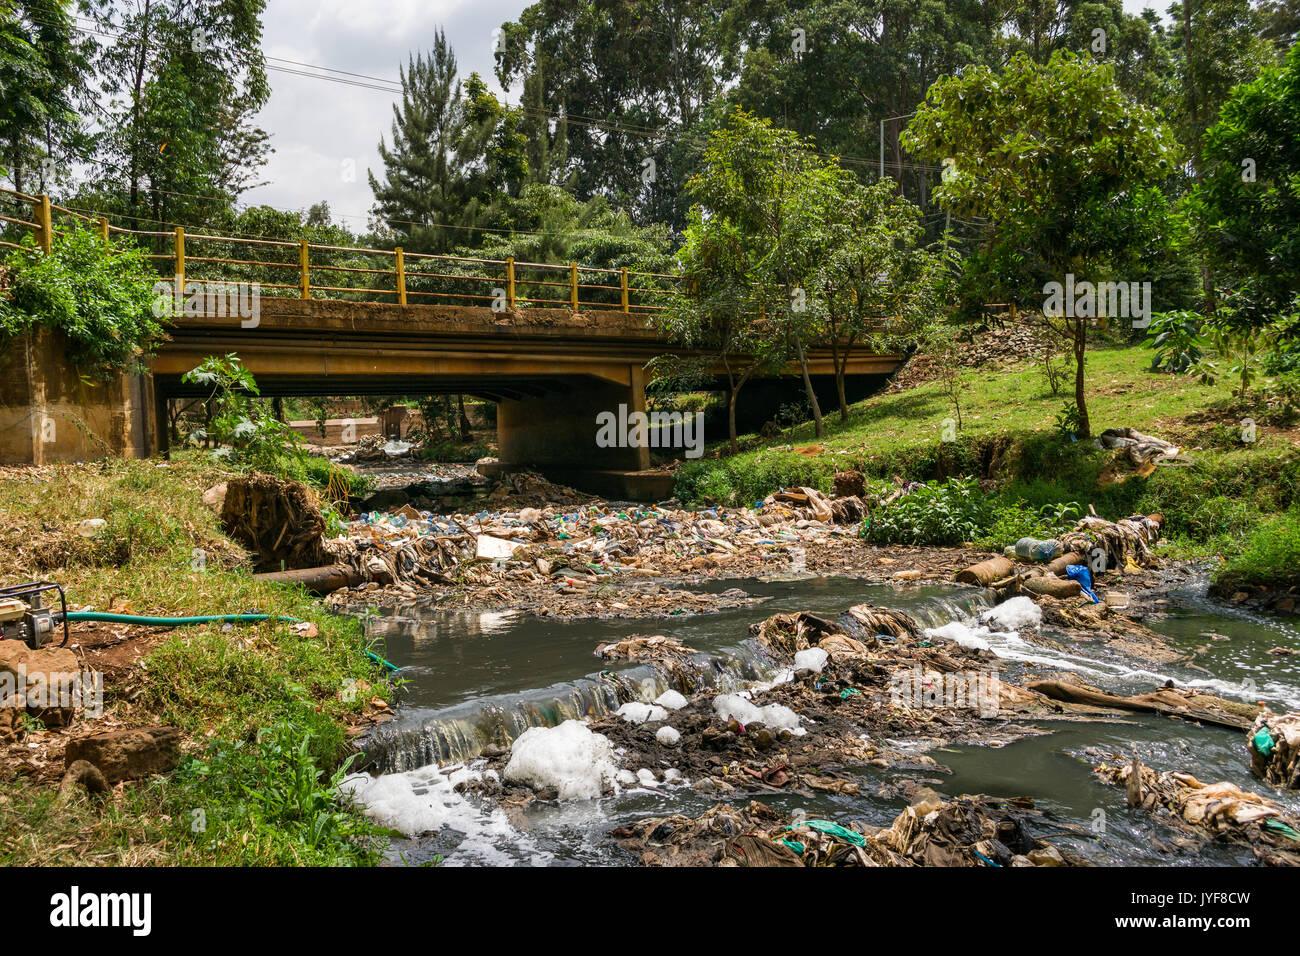 Plastic bottles and other waste rubbish blocking Nairobi river, Kenya Stock Photo